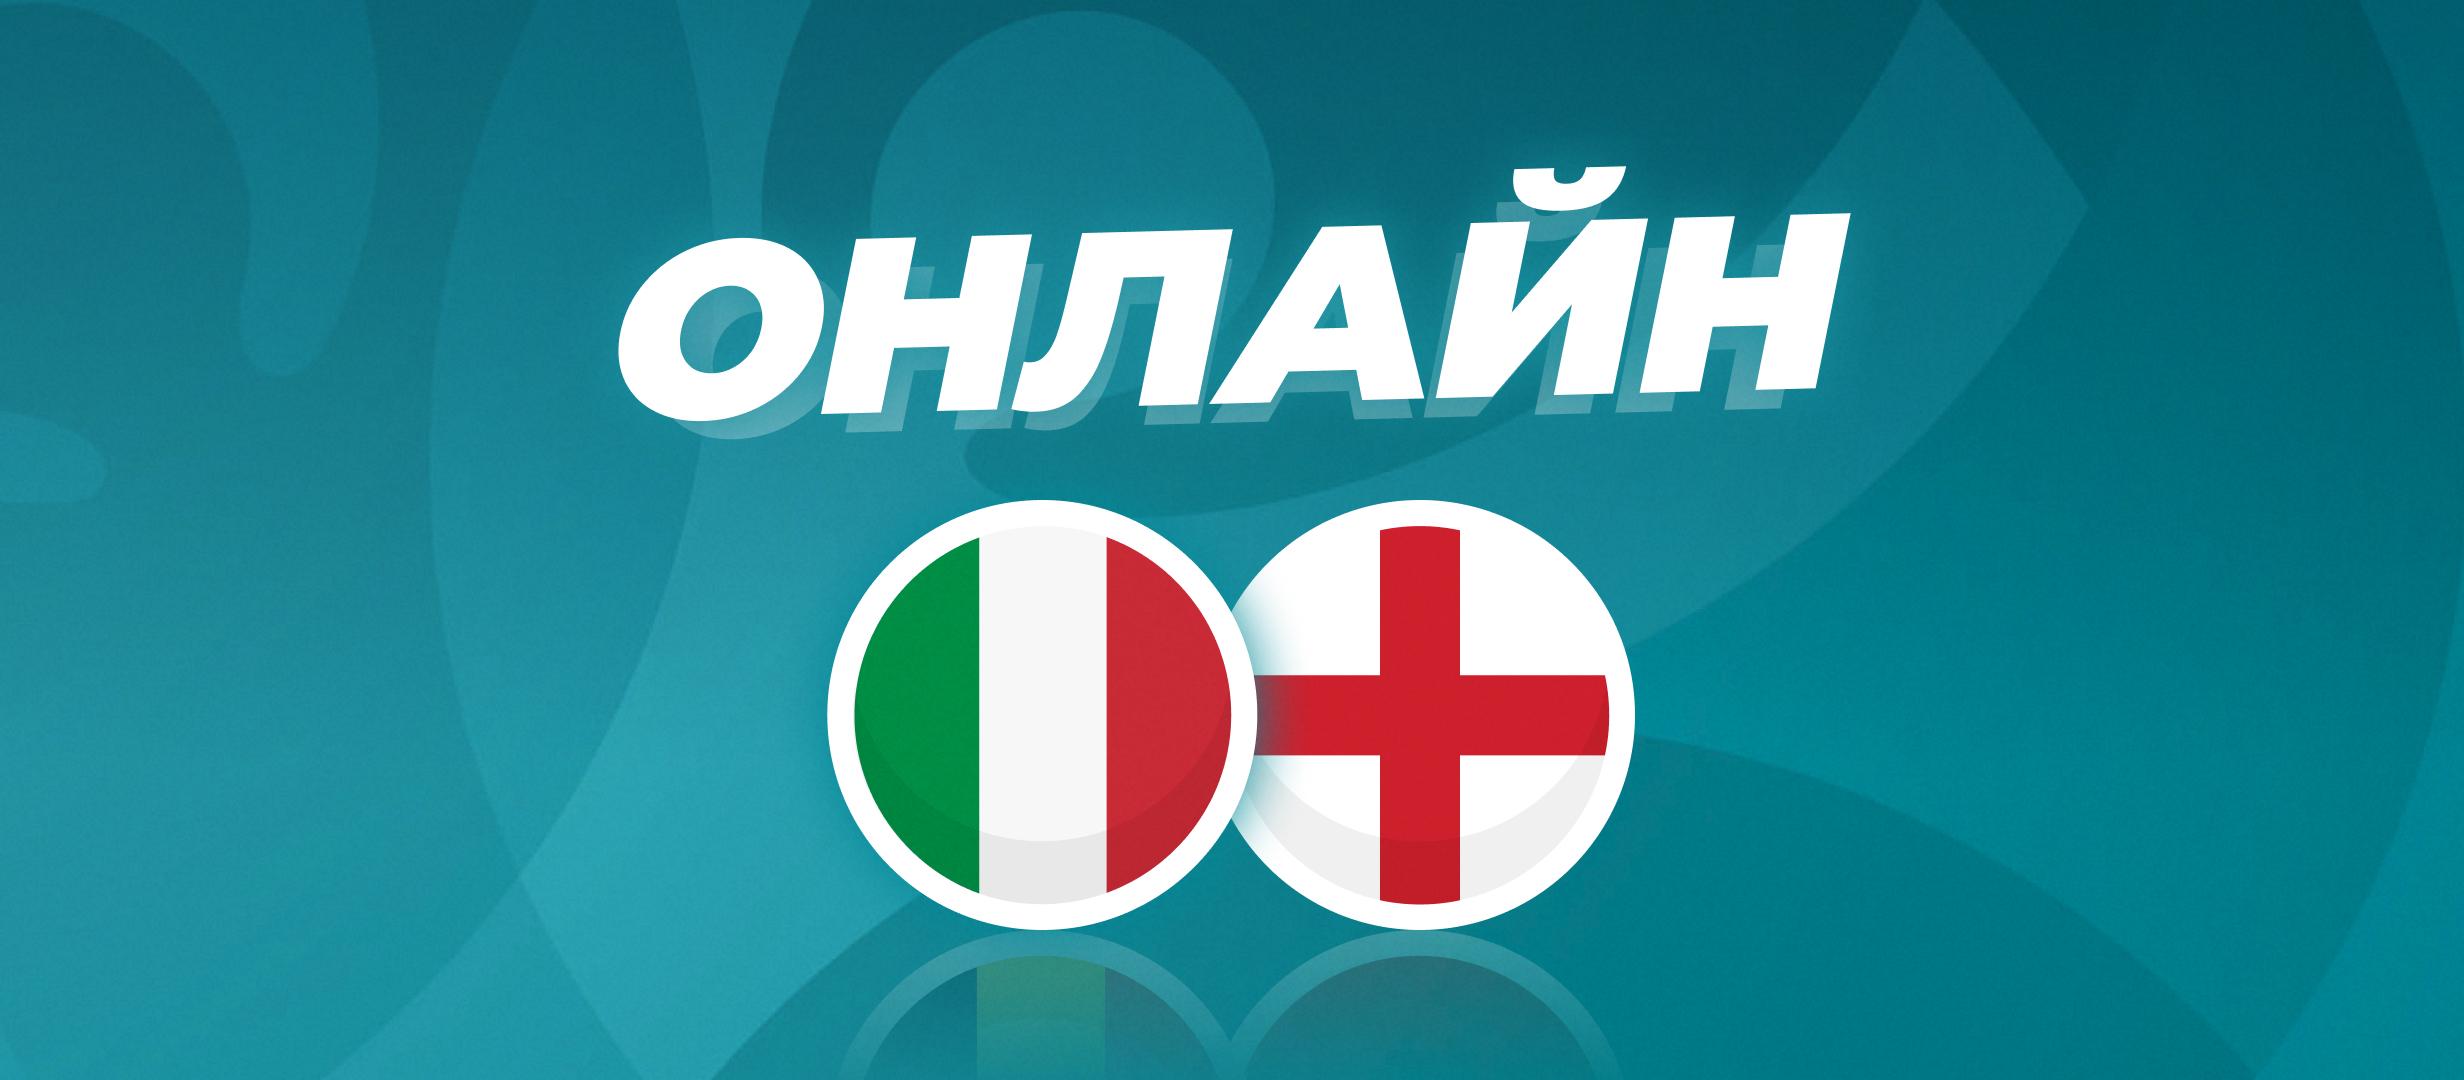 Италия — Англия: онлайн финала Евро-2020